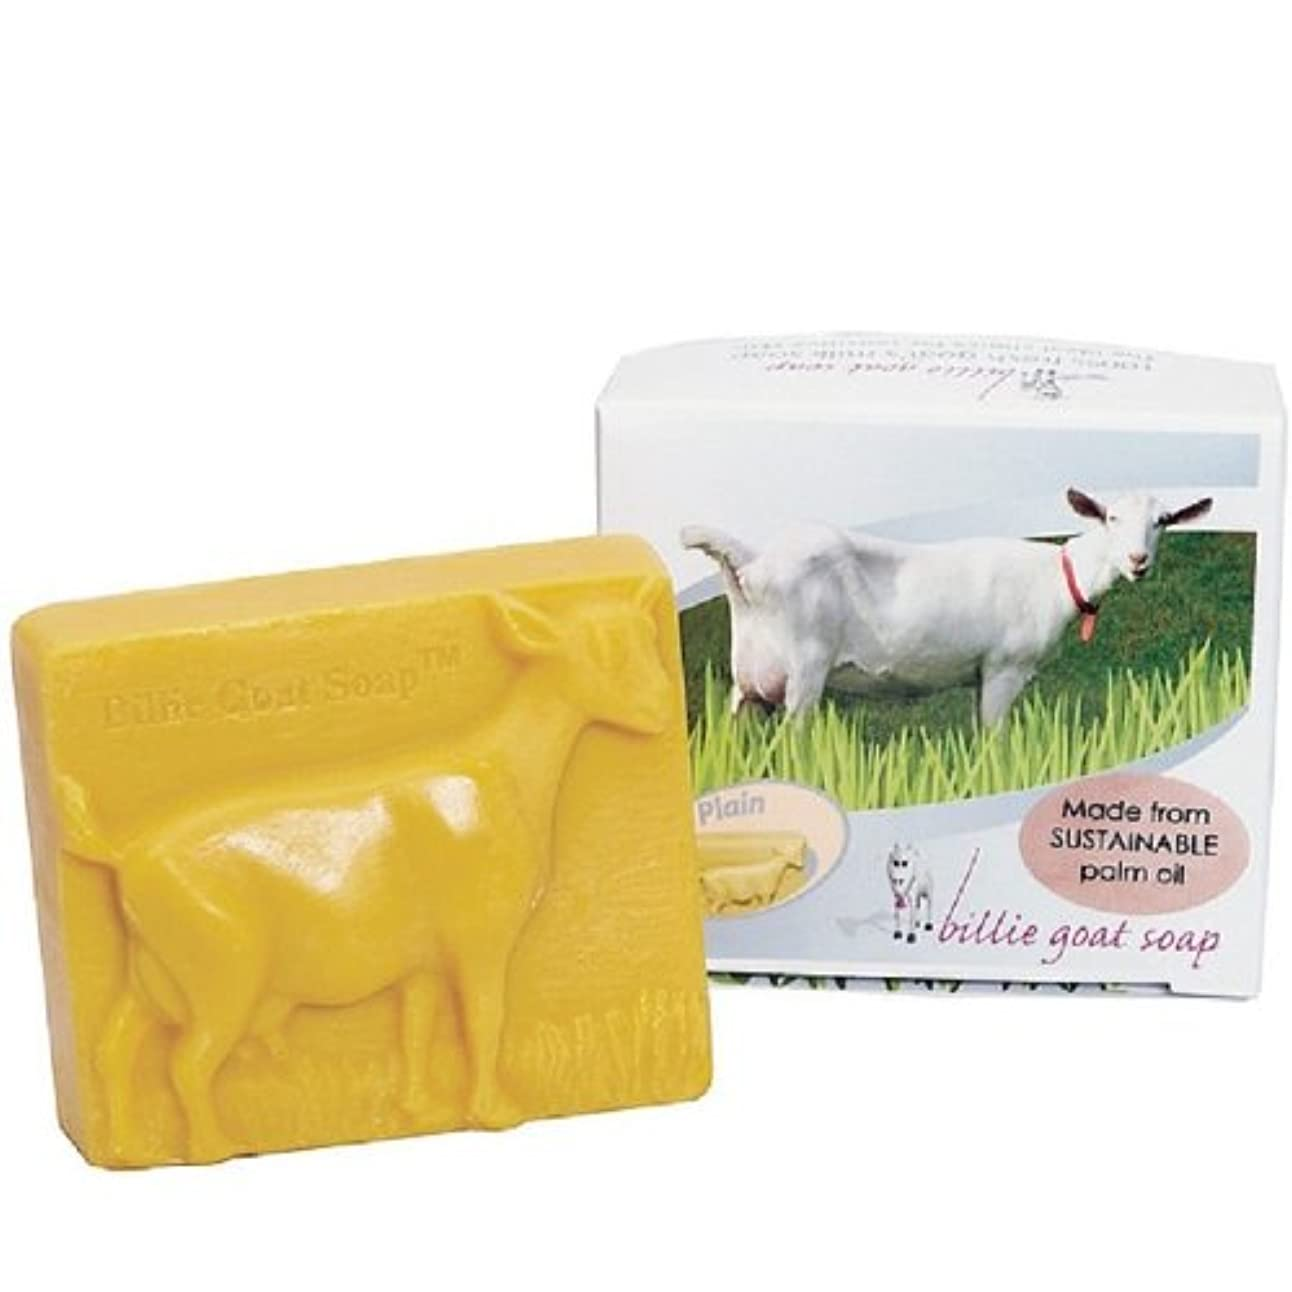 【BILLIE GOAT SOAP】ビリーゴートミルクソープ 3個セット パームオイル使用 プレーン